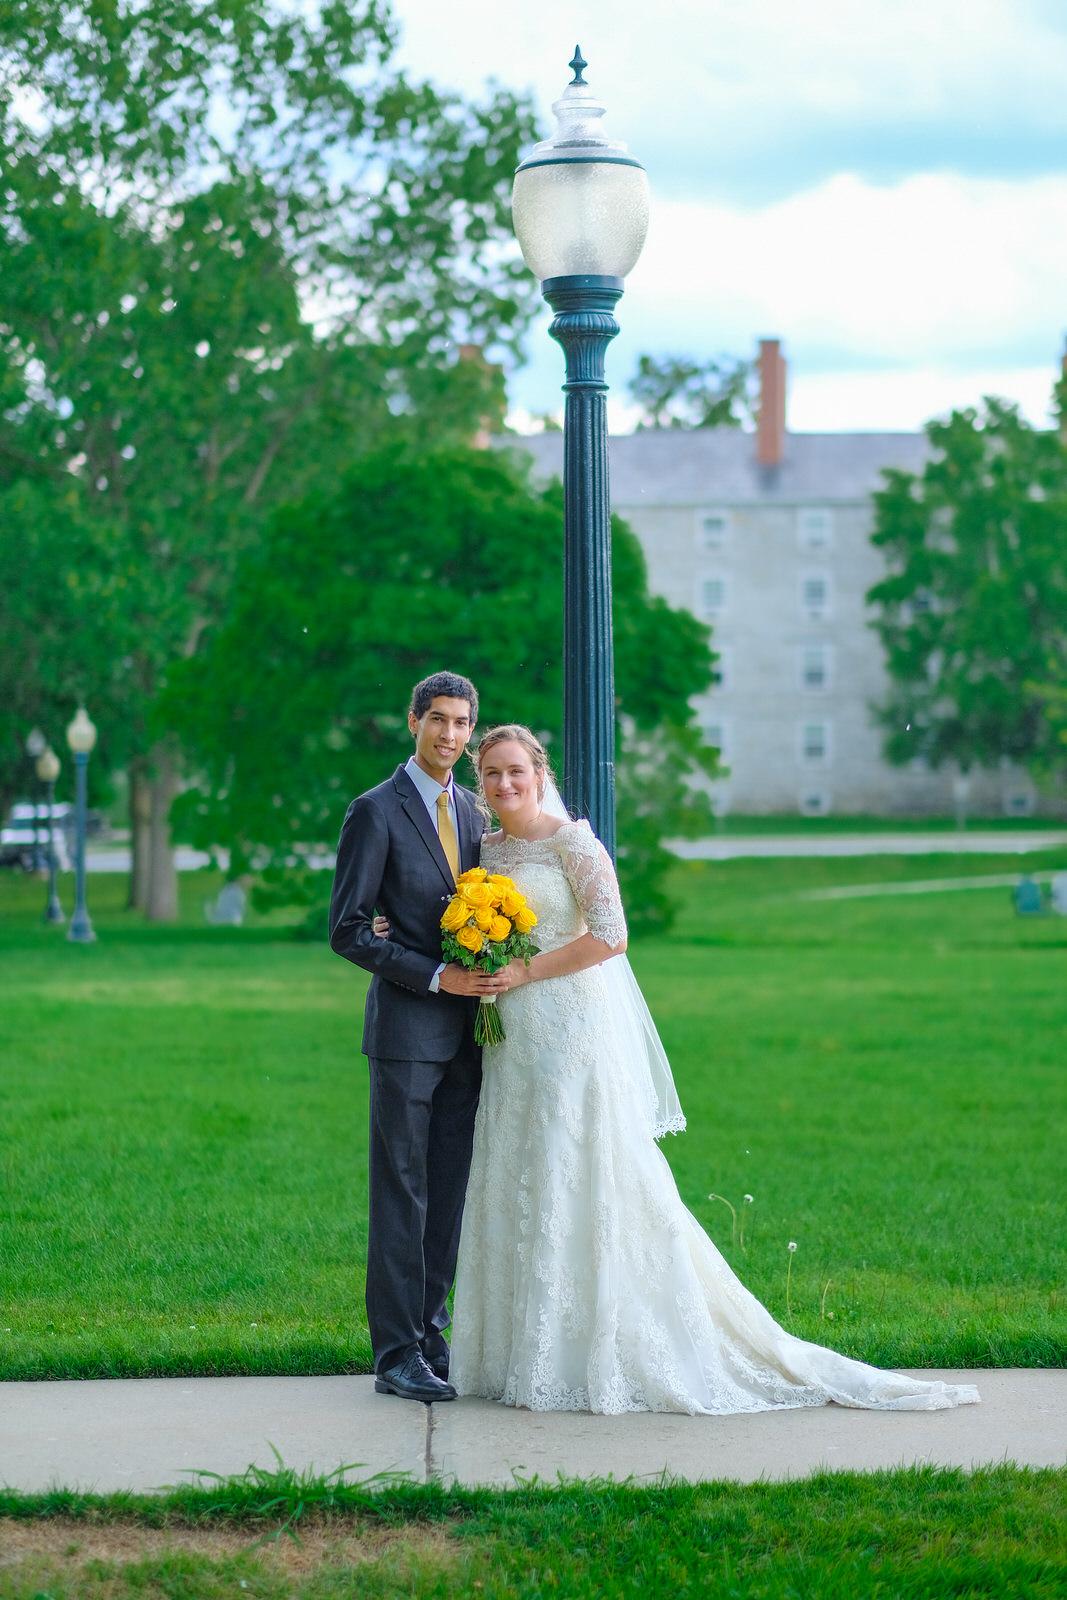 candid-vermont-wedding-photography-817.jpg